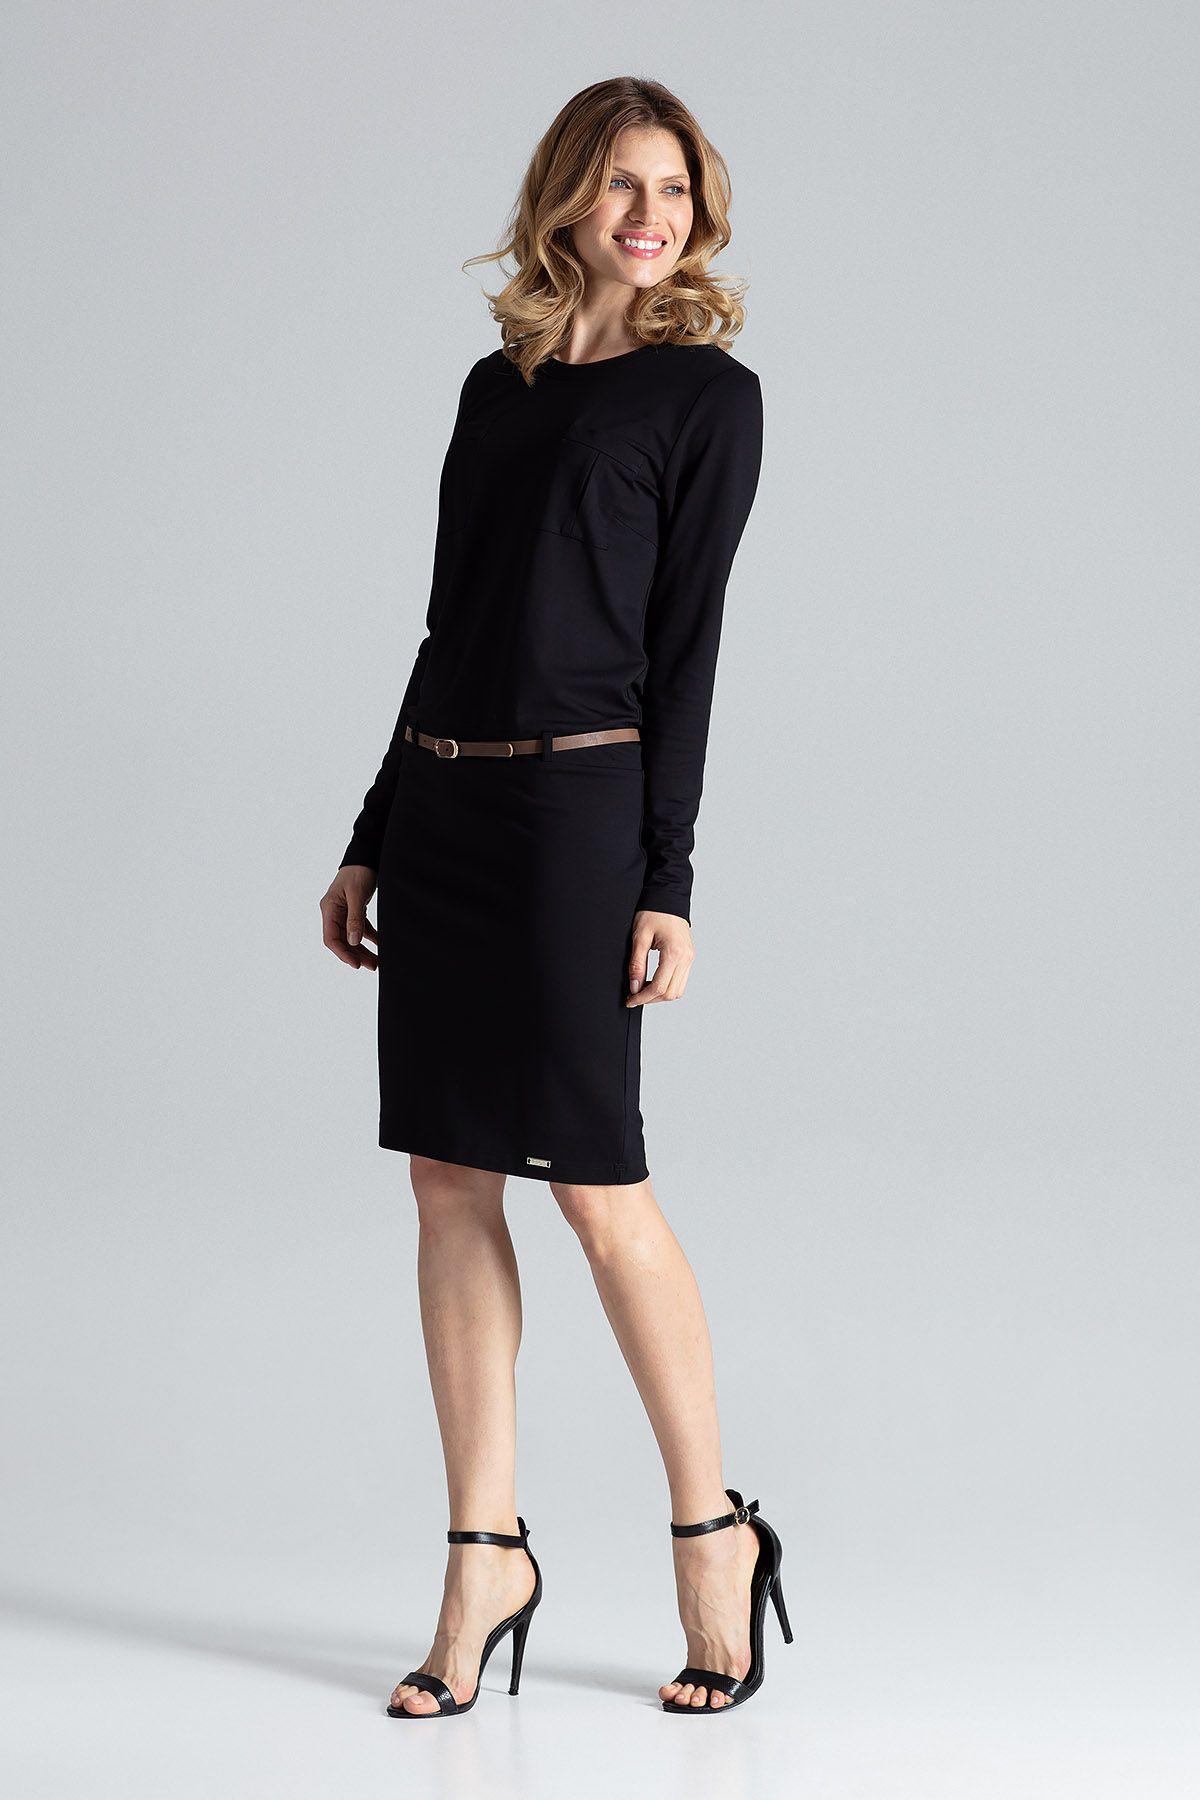 Black Comfy Long-Sleeve Dress